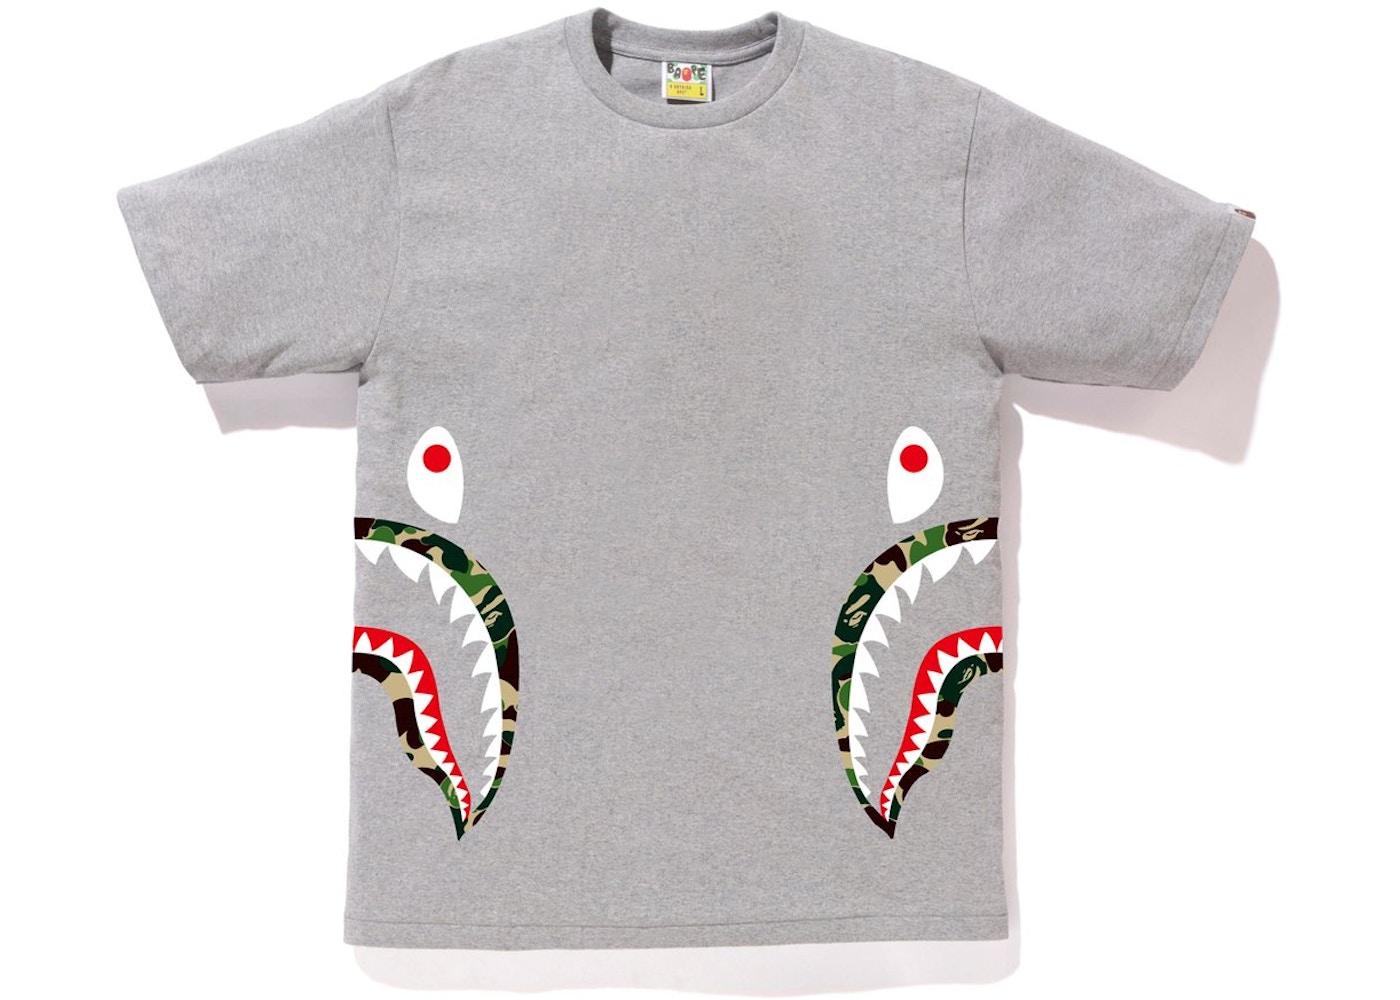 accff884 BAPE ABC Side Shark Tee Gray/Green - SS18